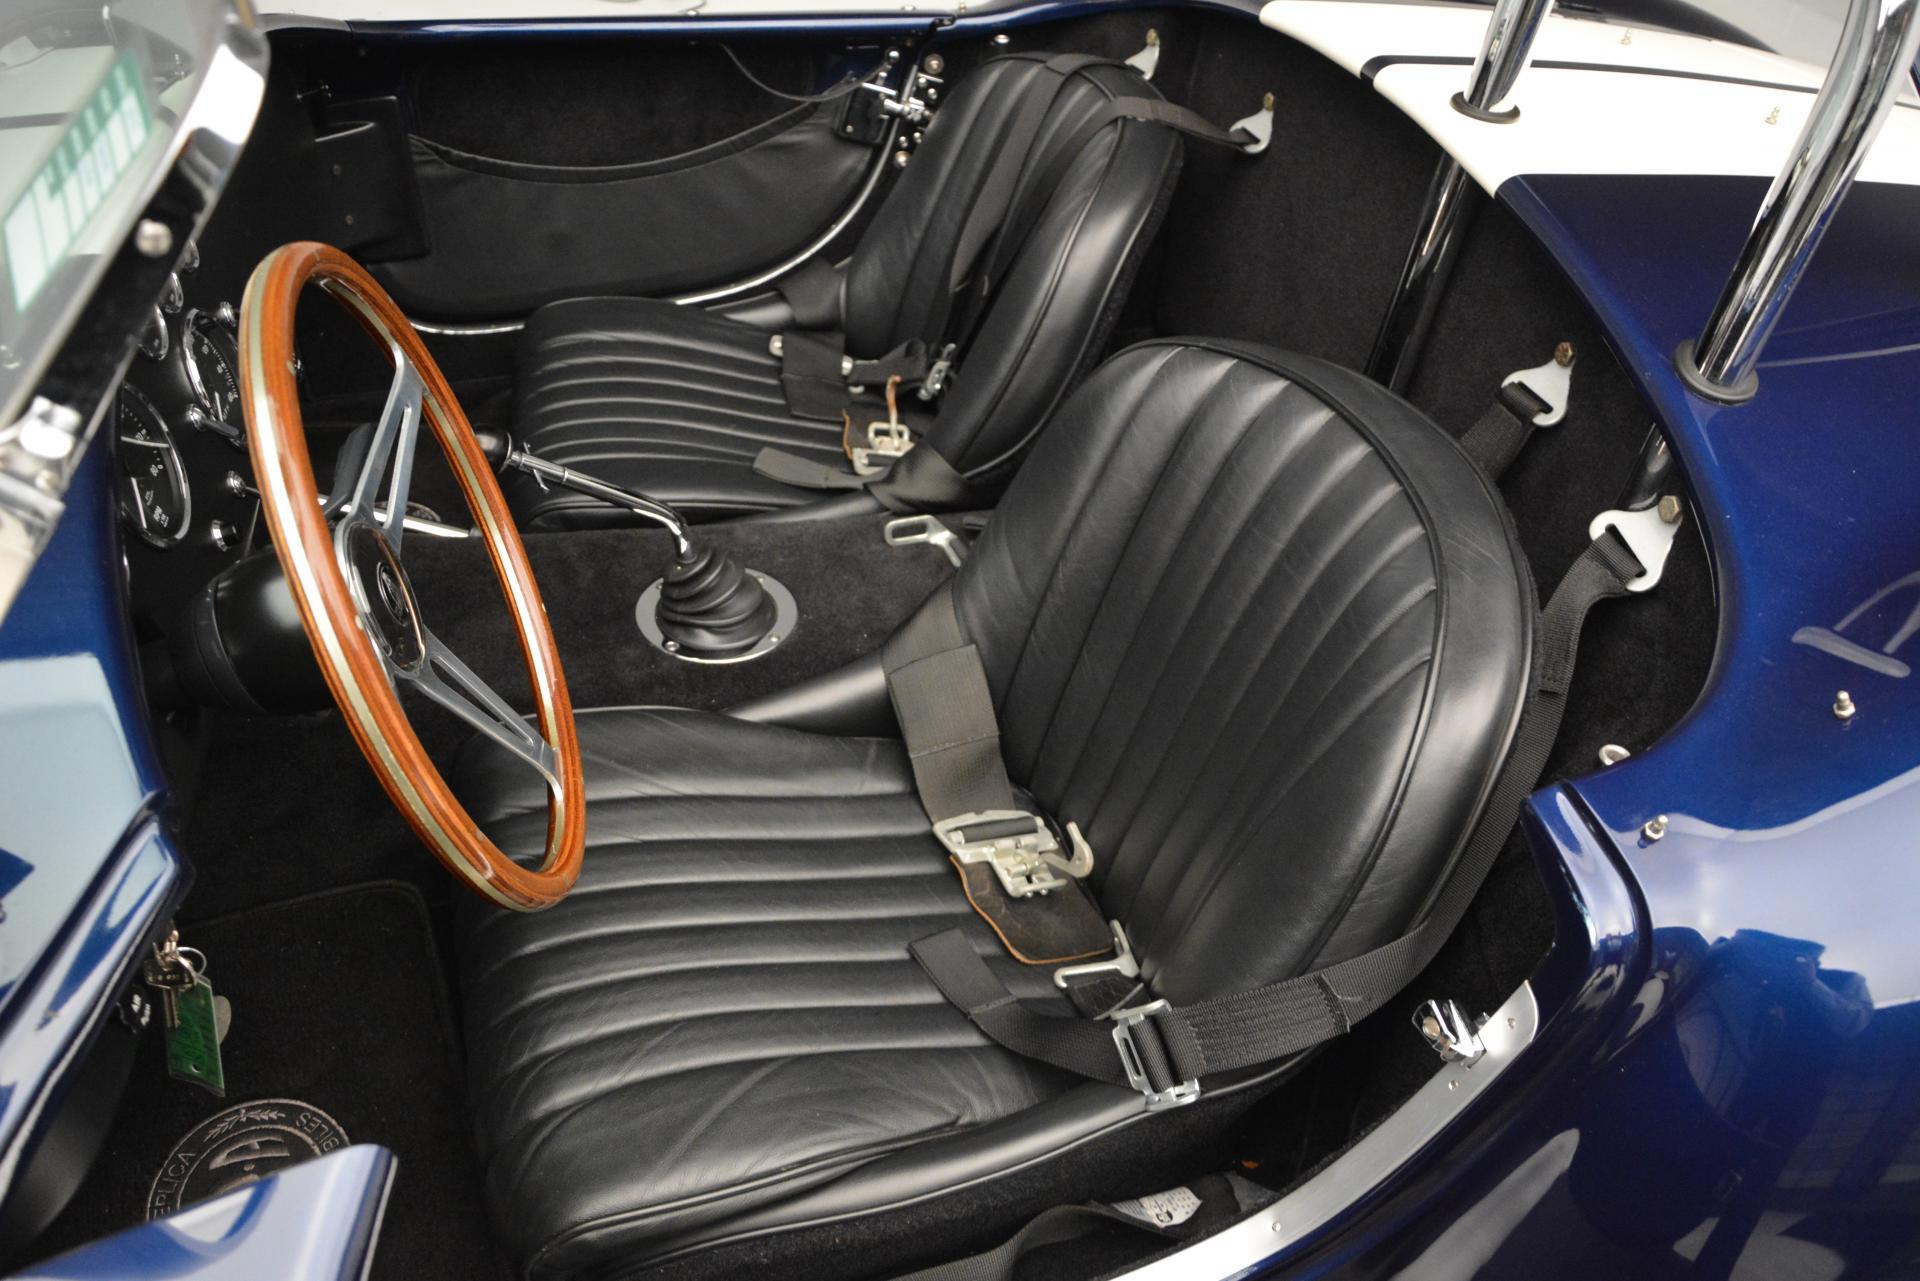 Used 2006 Ford ERA 427 SC  For Sale In Greenwich, CT. Alfa Romeo of Greenwich, 7051 107_p13